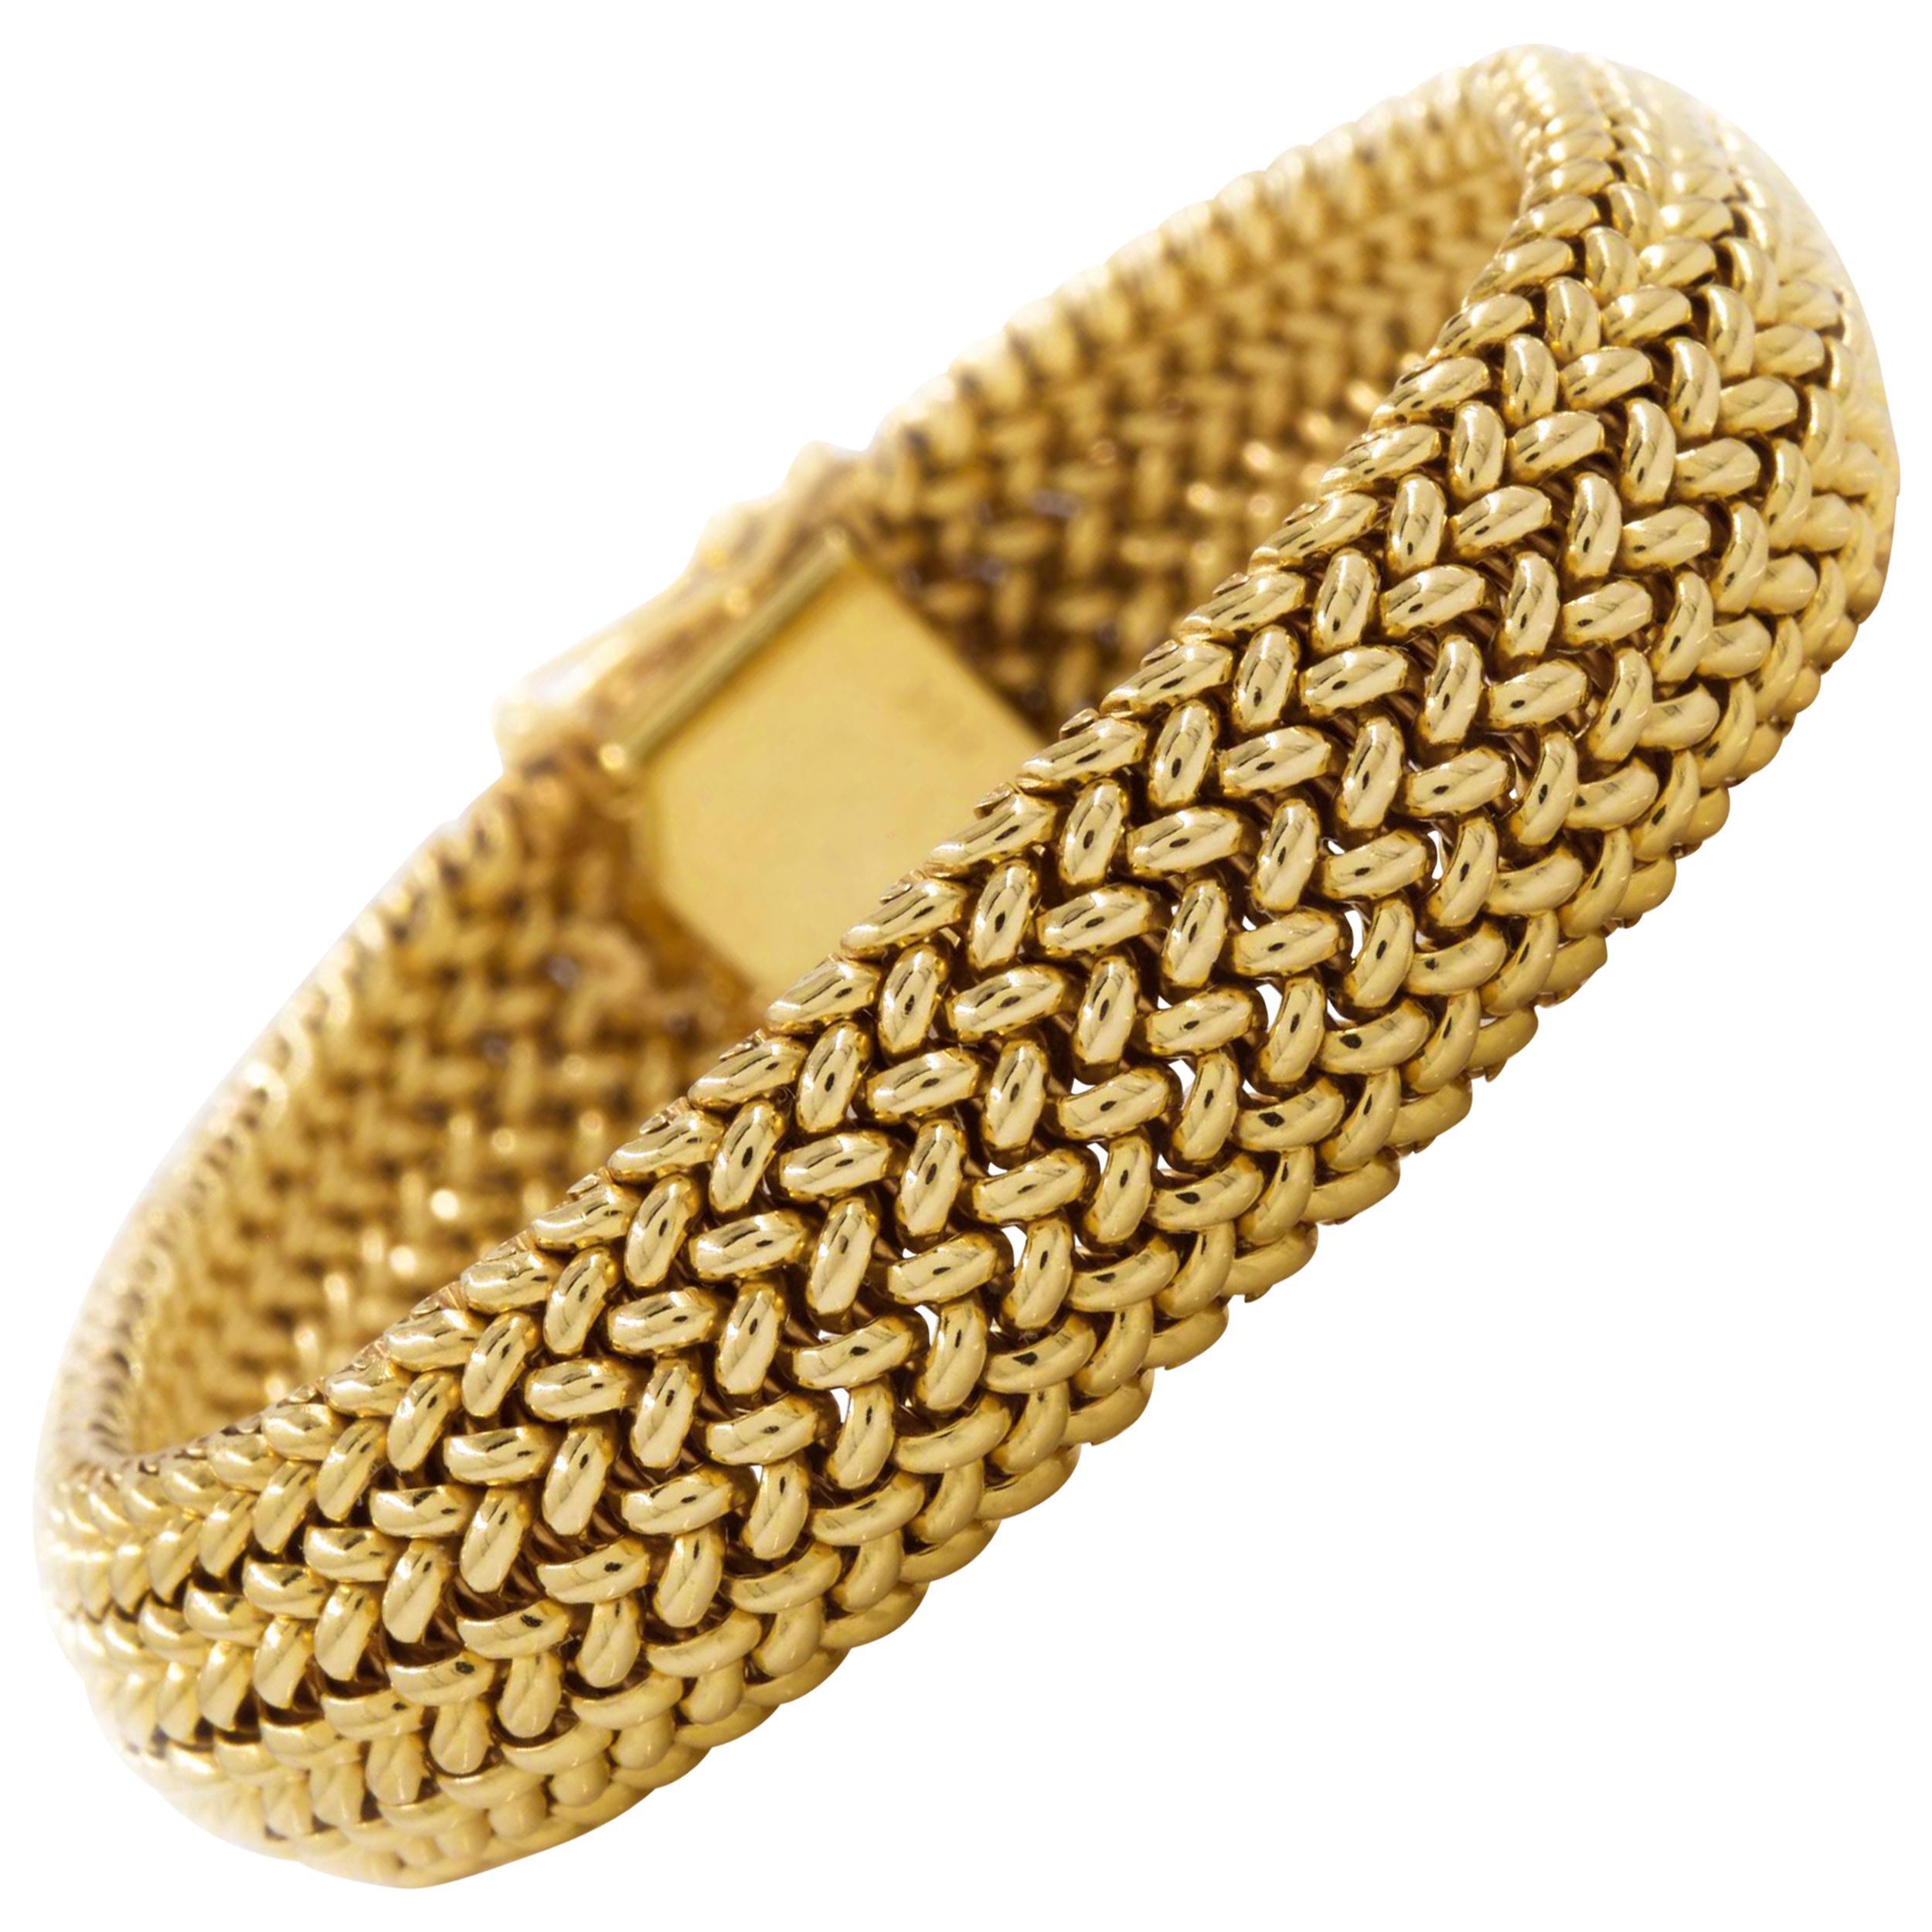 Vintage Mid-Century Modern Woven 14-Karat Yellow Gold Bracelet, circa 1960s